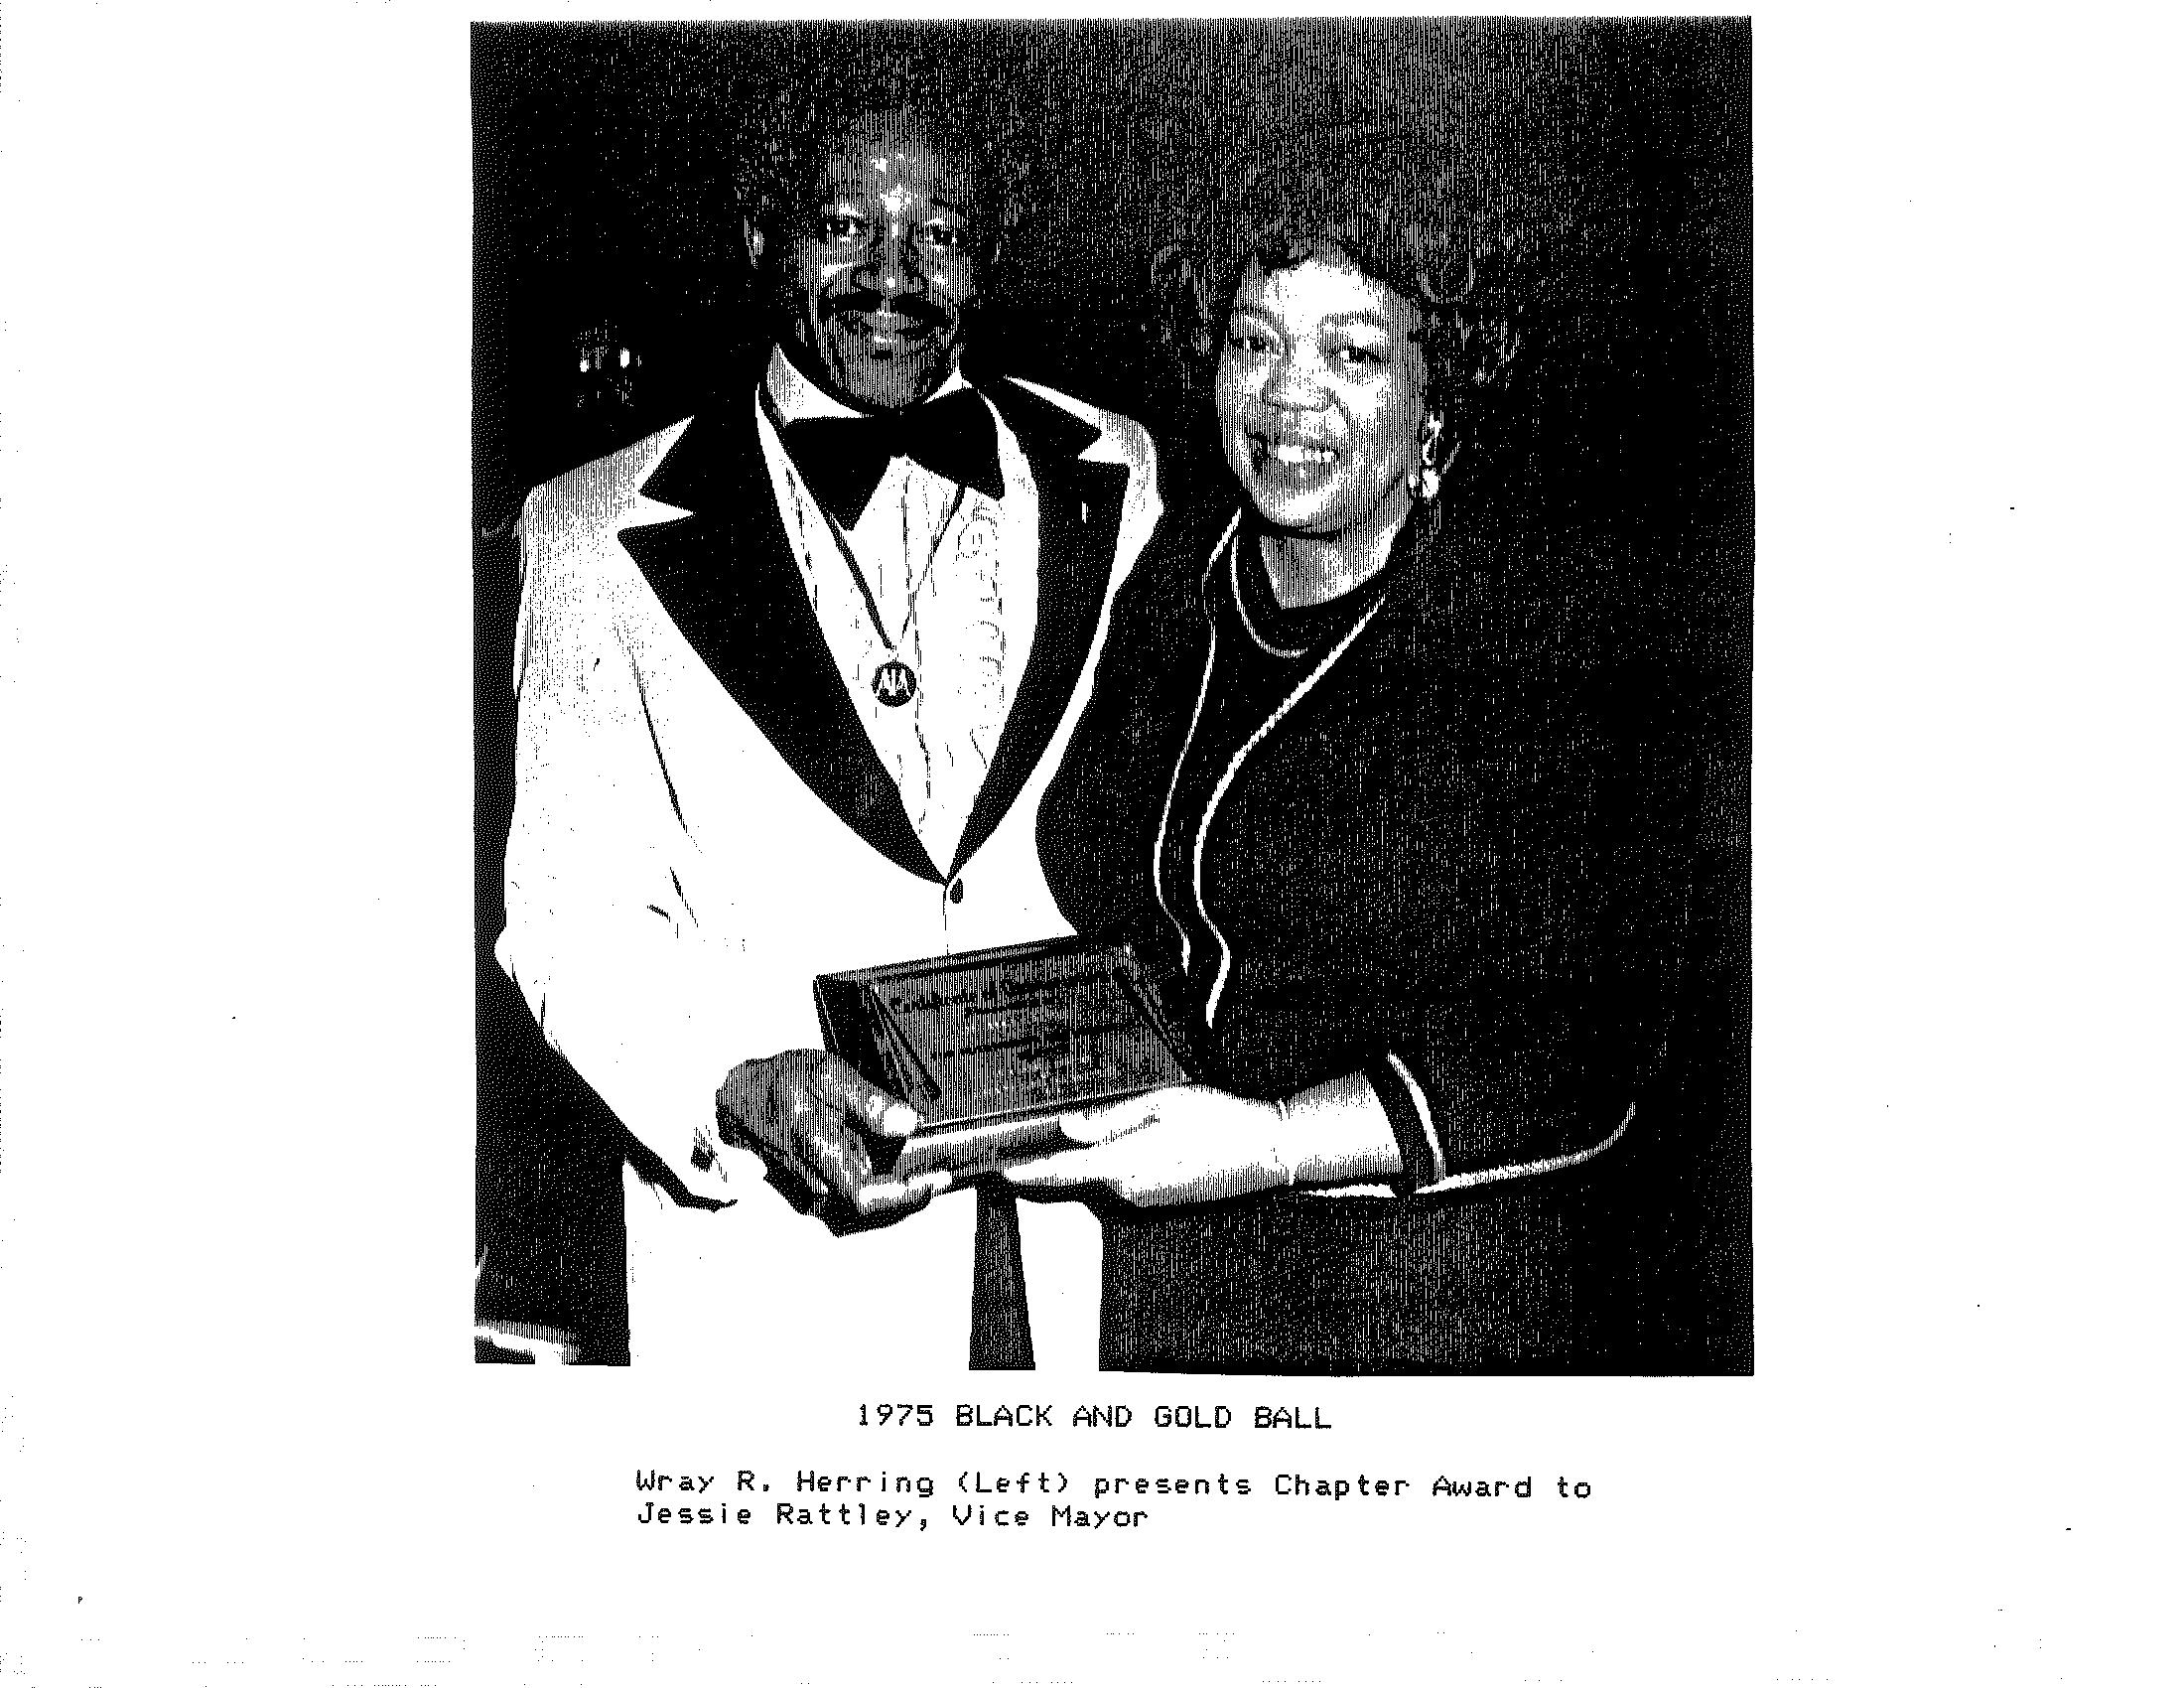 Zeta Lambda 1975 - Black and Gold Ball, Chapter Award to Vice Mayor Jessie Rattley.png